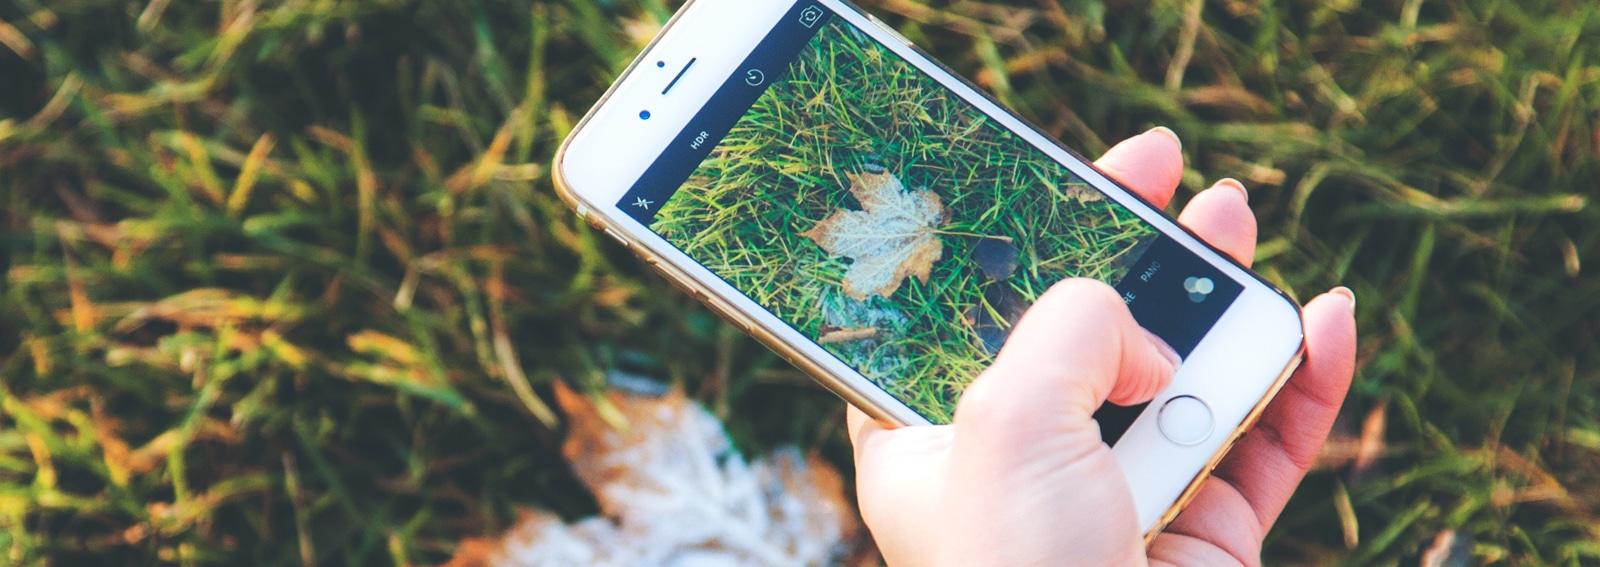 visore-app-fotoritoccoDESK